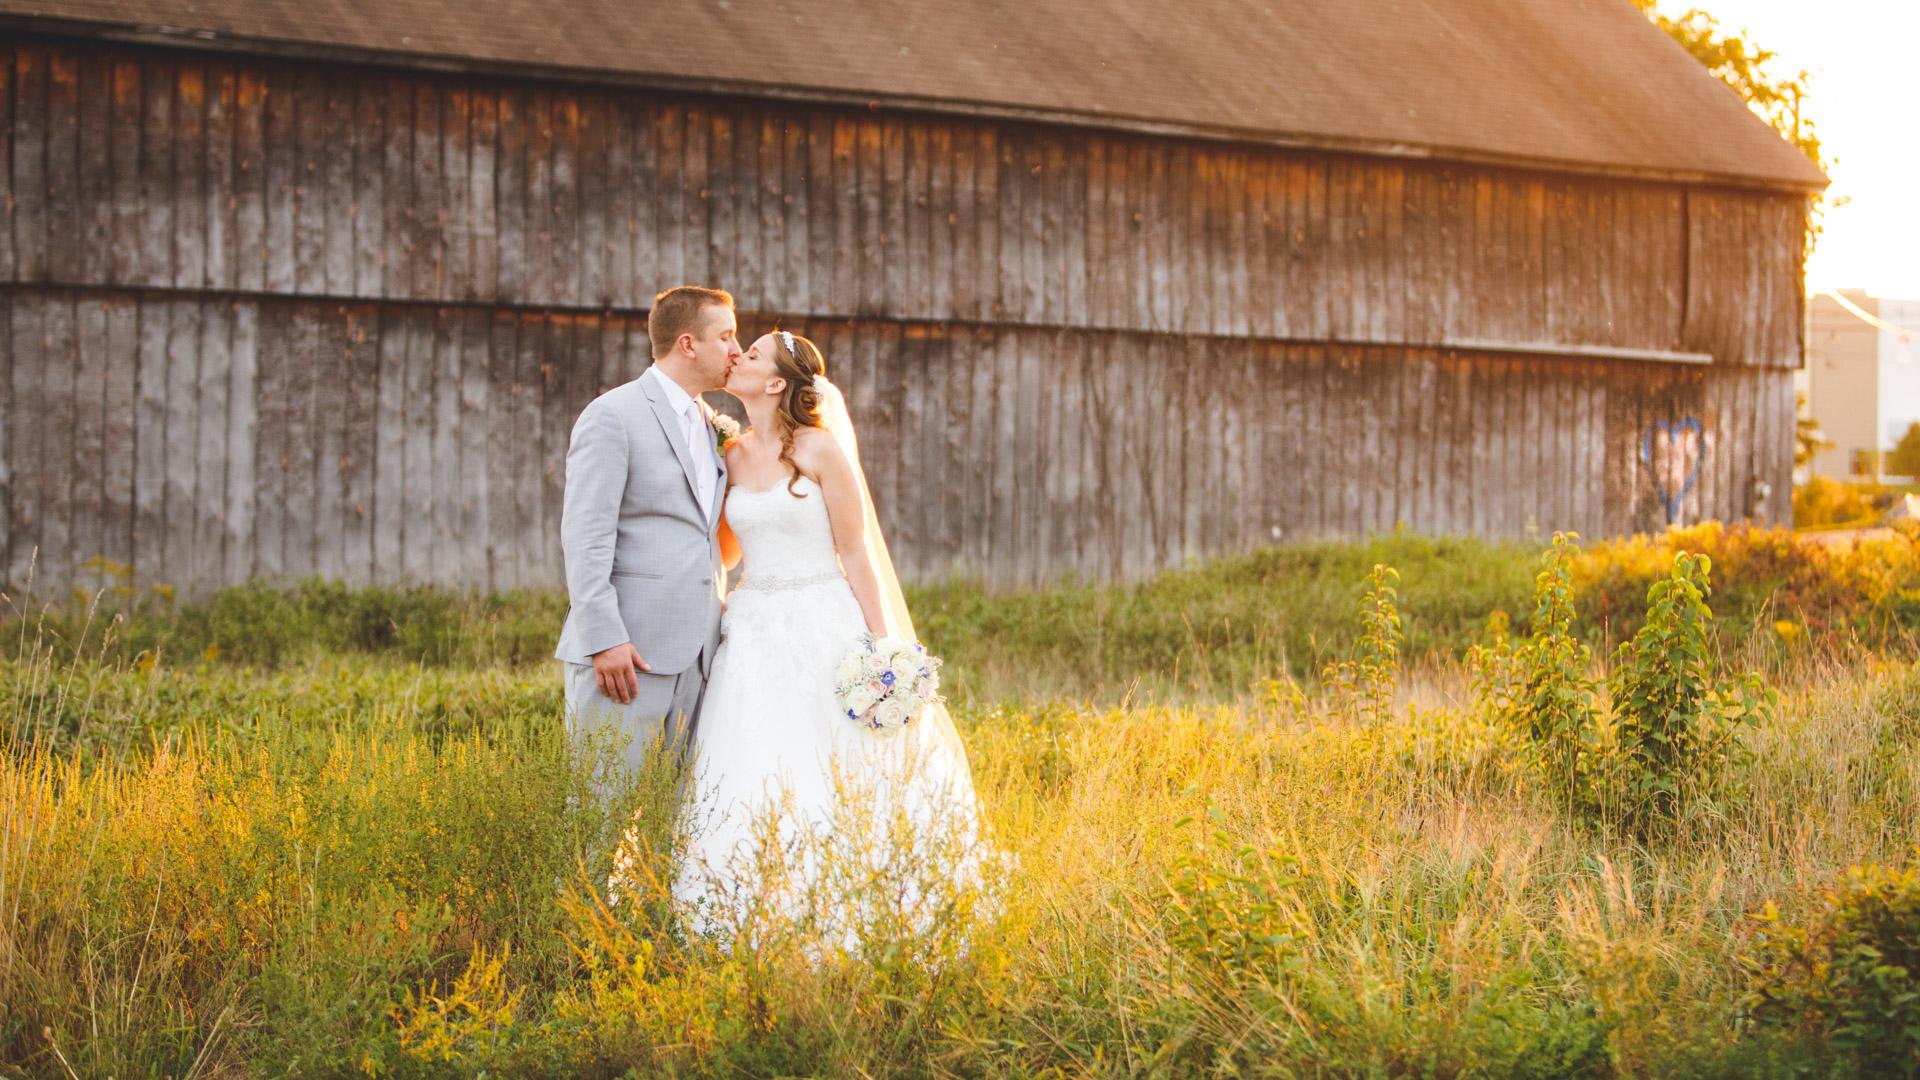 Rustic-Barn-Wedding-Photo-Maneeleys-CT.jpg